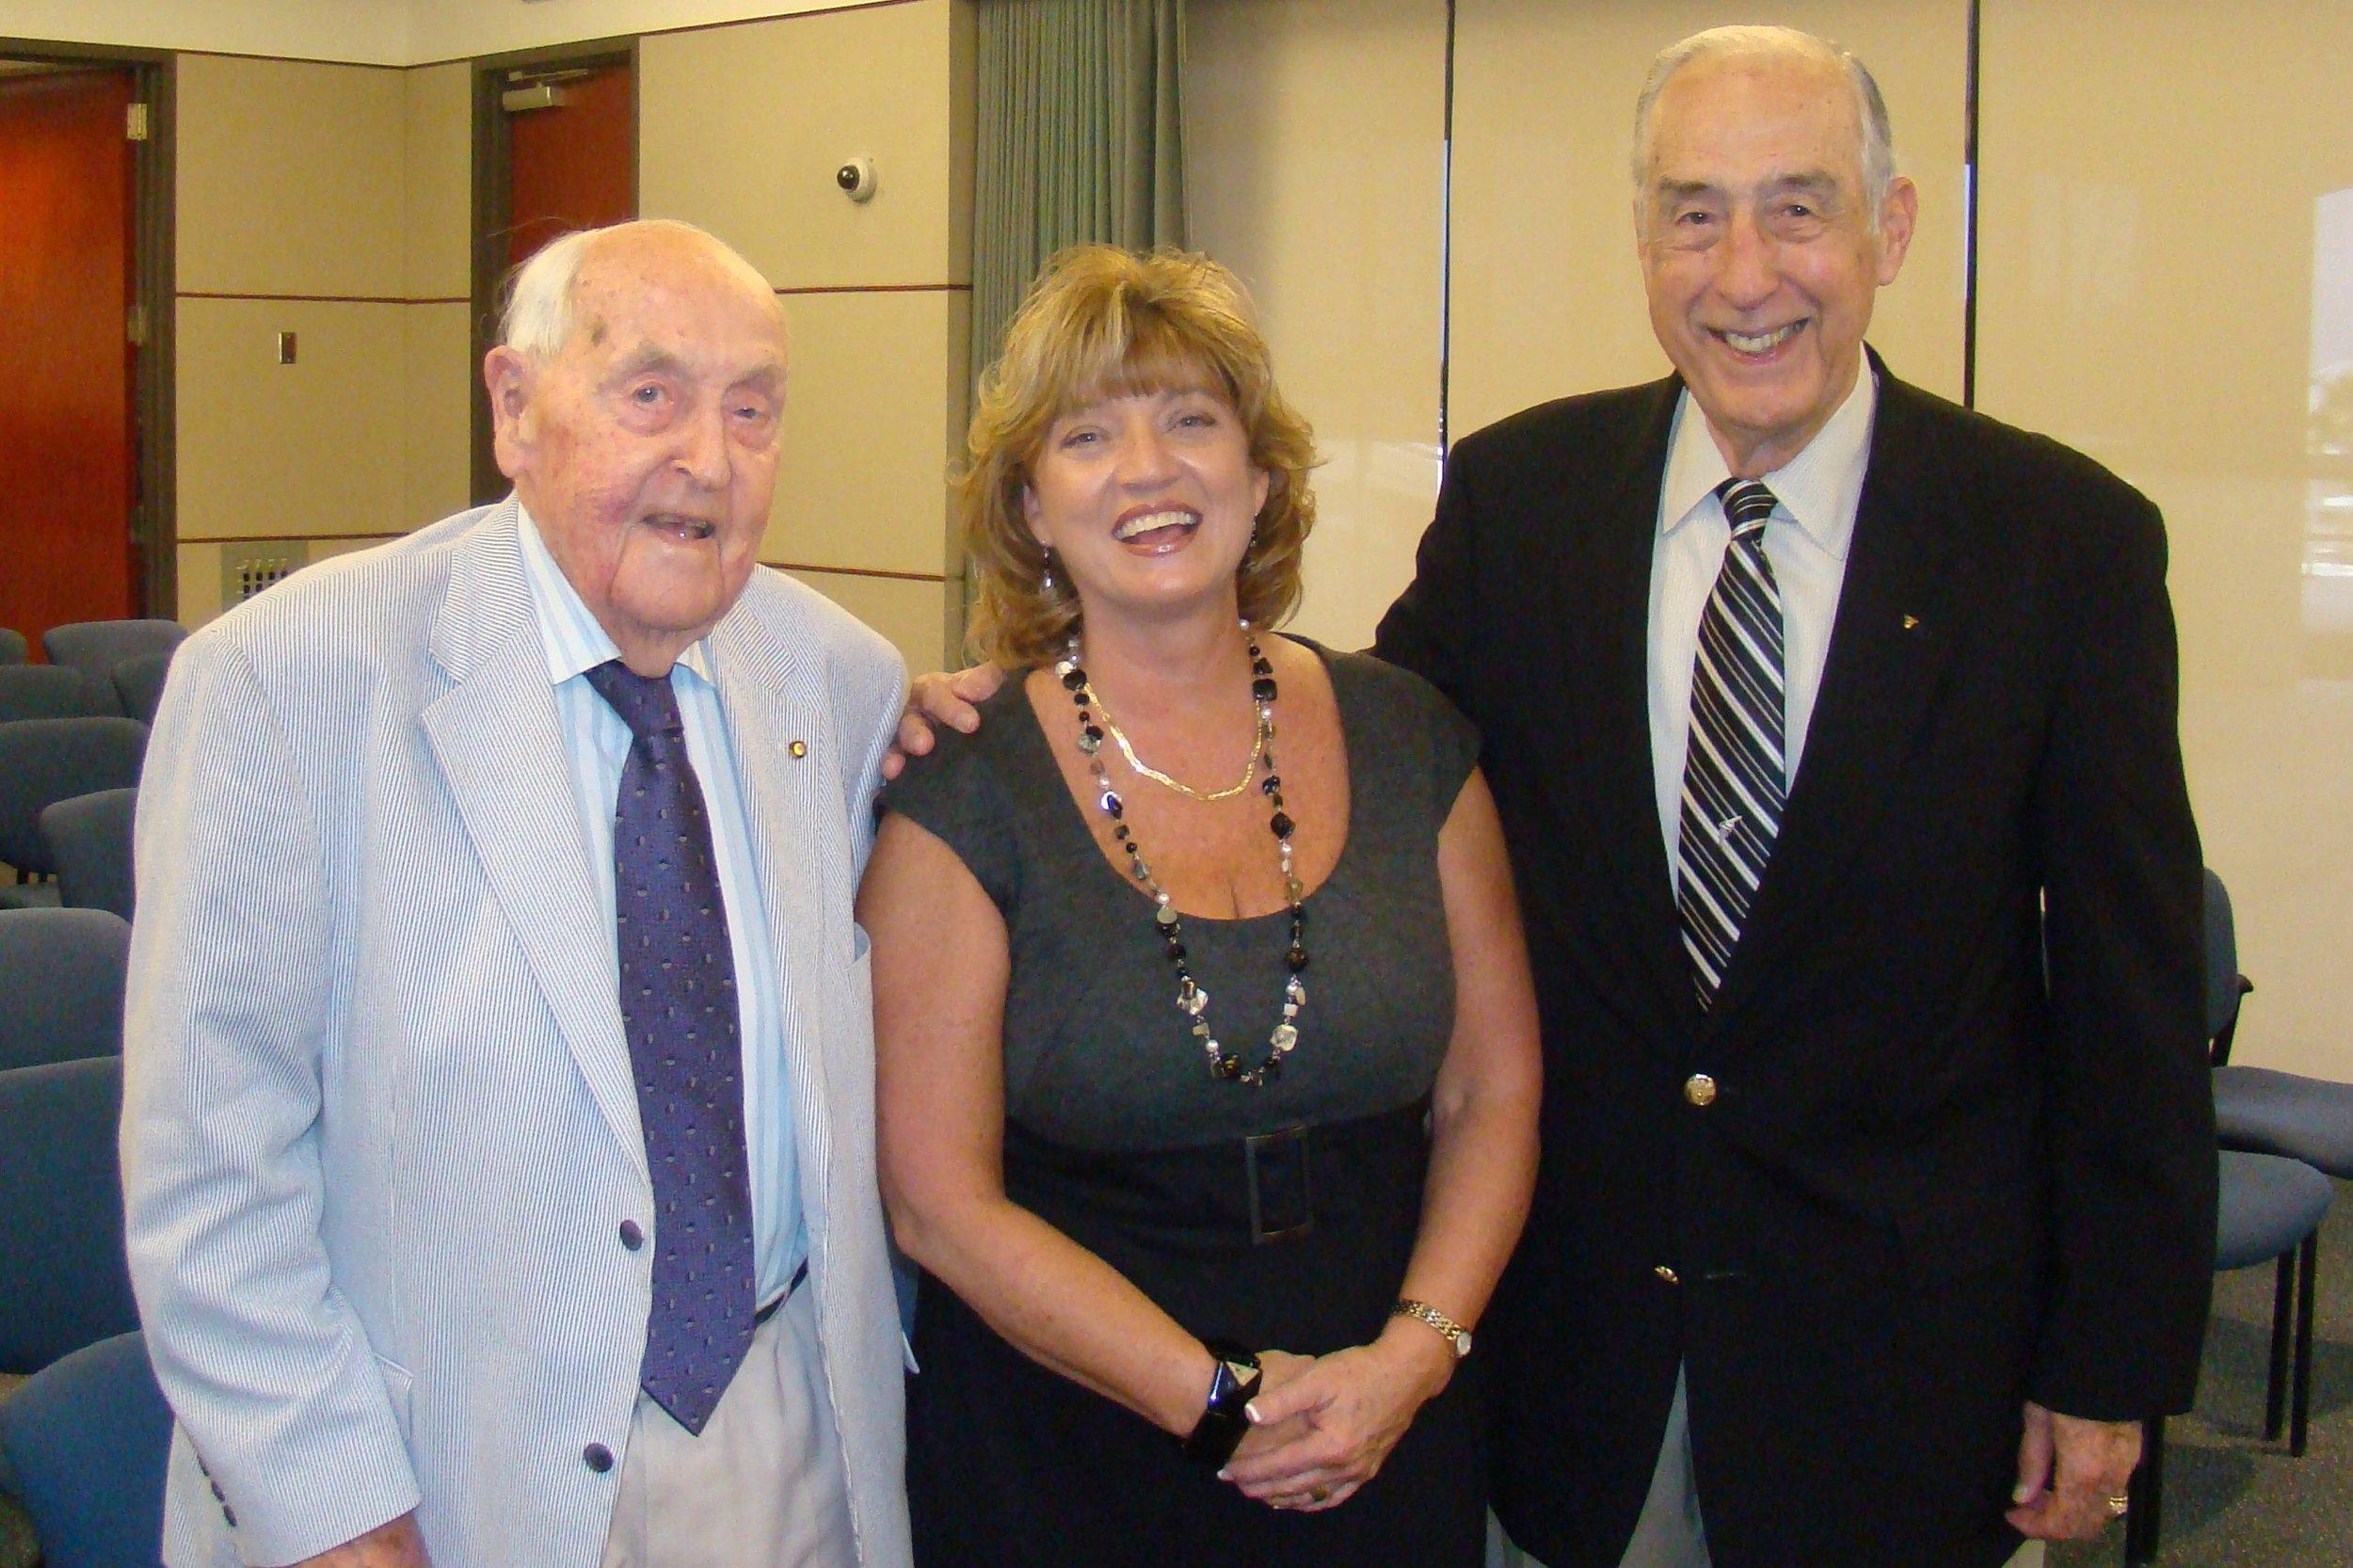 Sir Lenox, Colleen Picard & Dick Newton - 1, 27 Oct '11.JPG